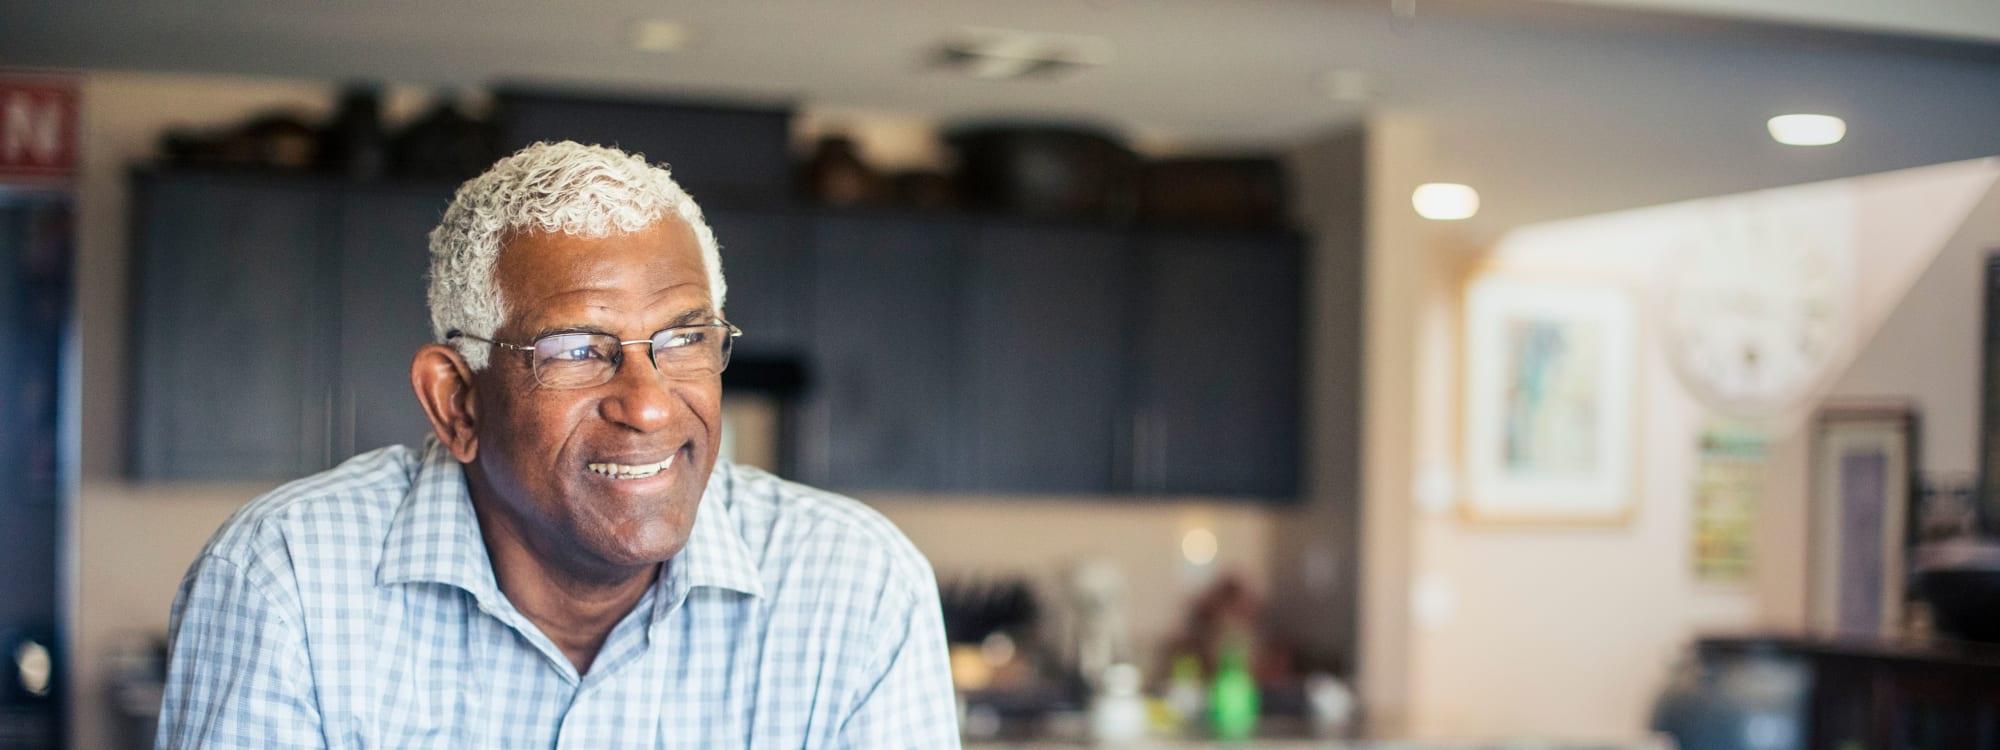 Senior Living at Aurora on France in Edina, Minnesota